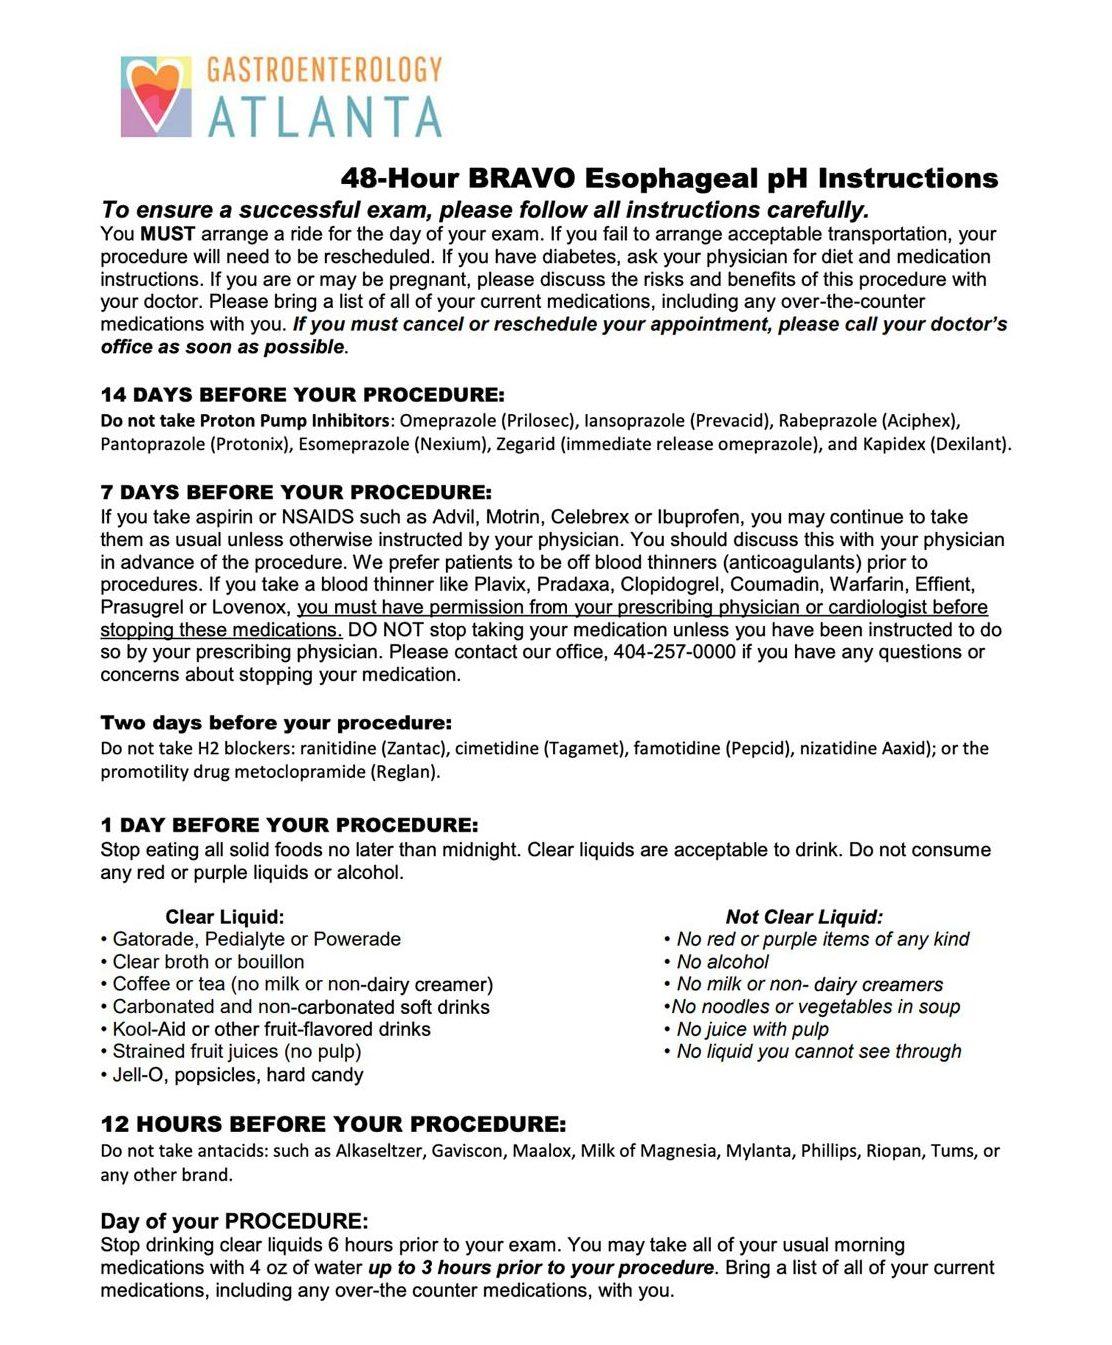 48 Hour BRAVO Esophageal pH Instructions